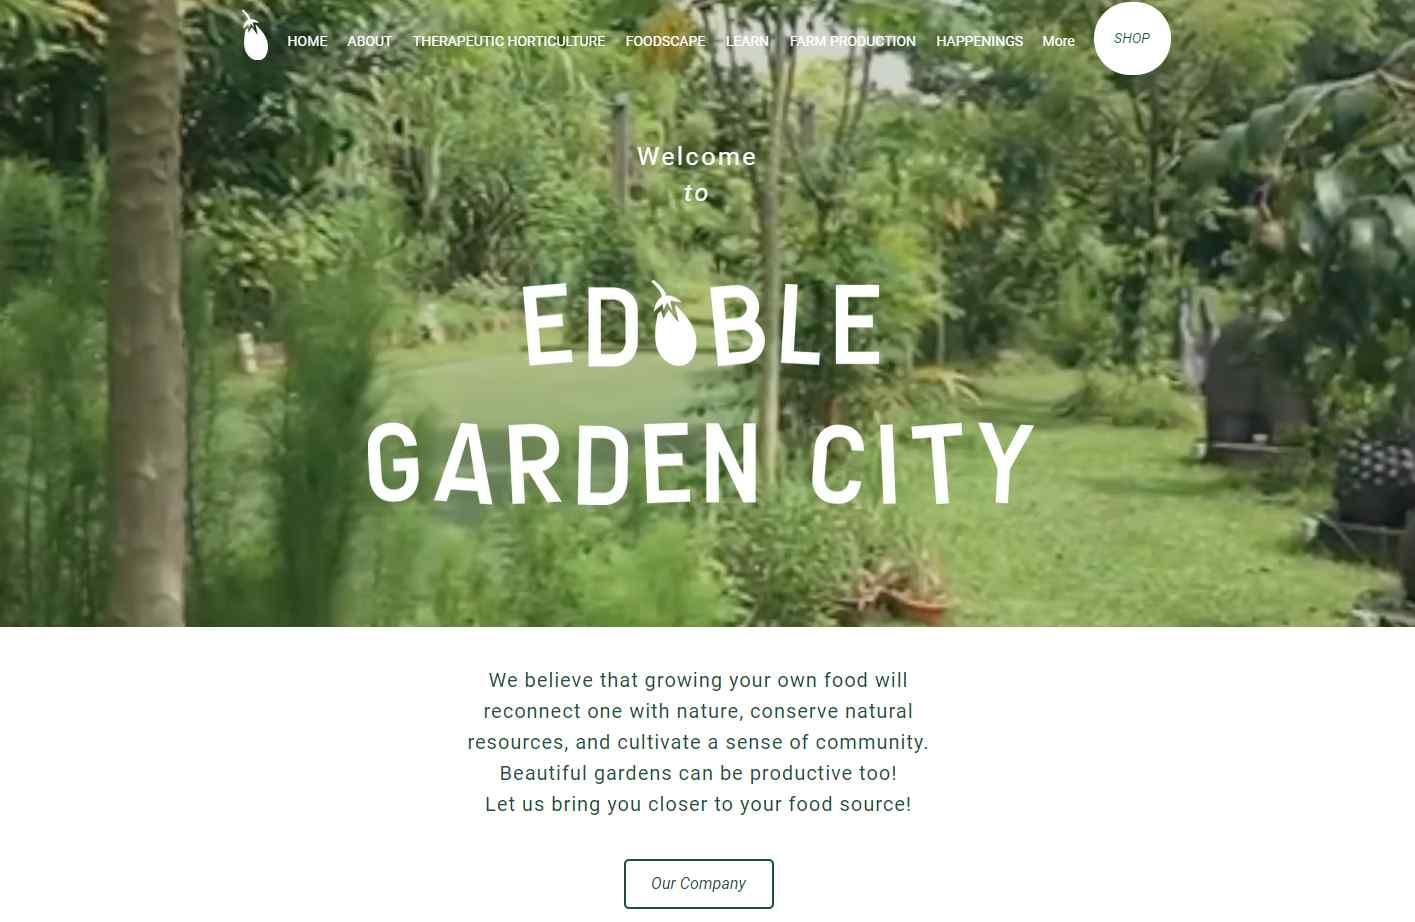 edible garden city Top Horticulture Services in Singapore